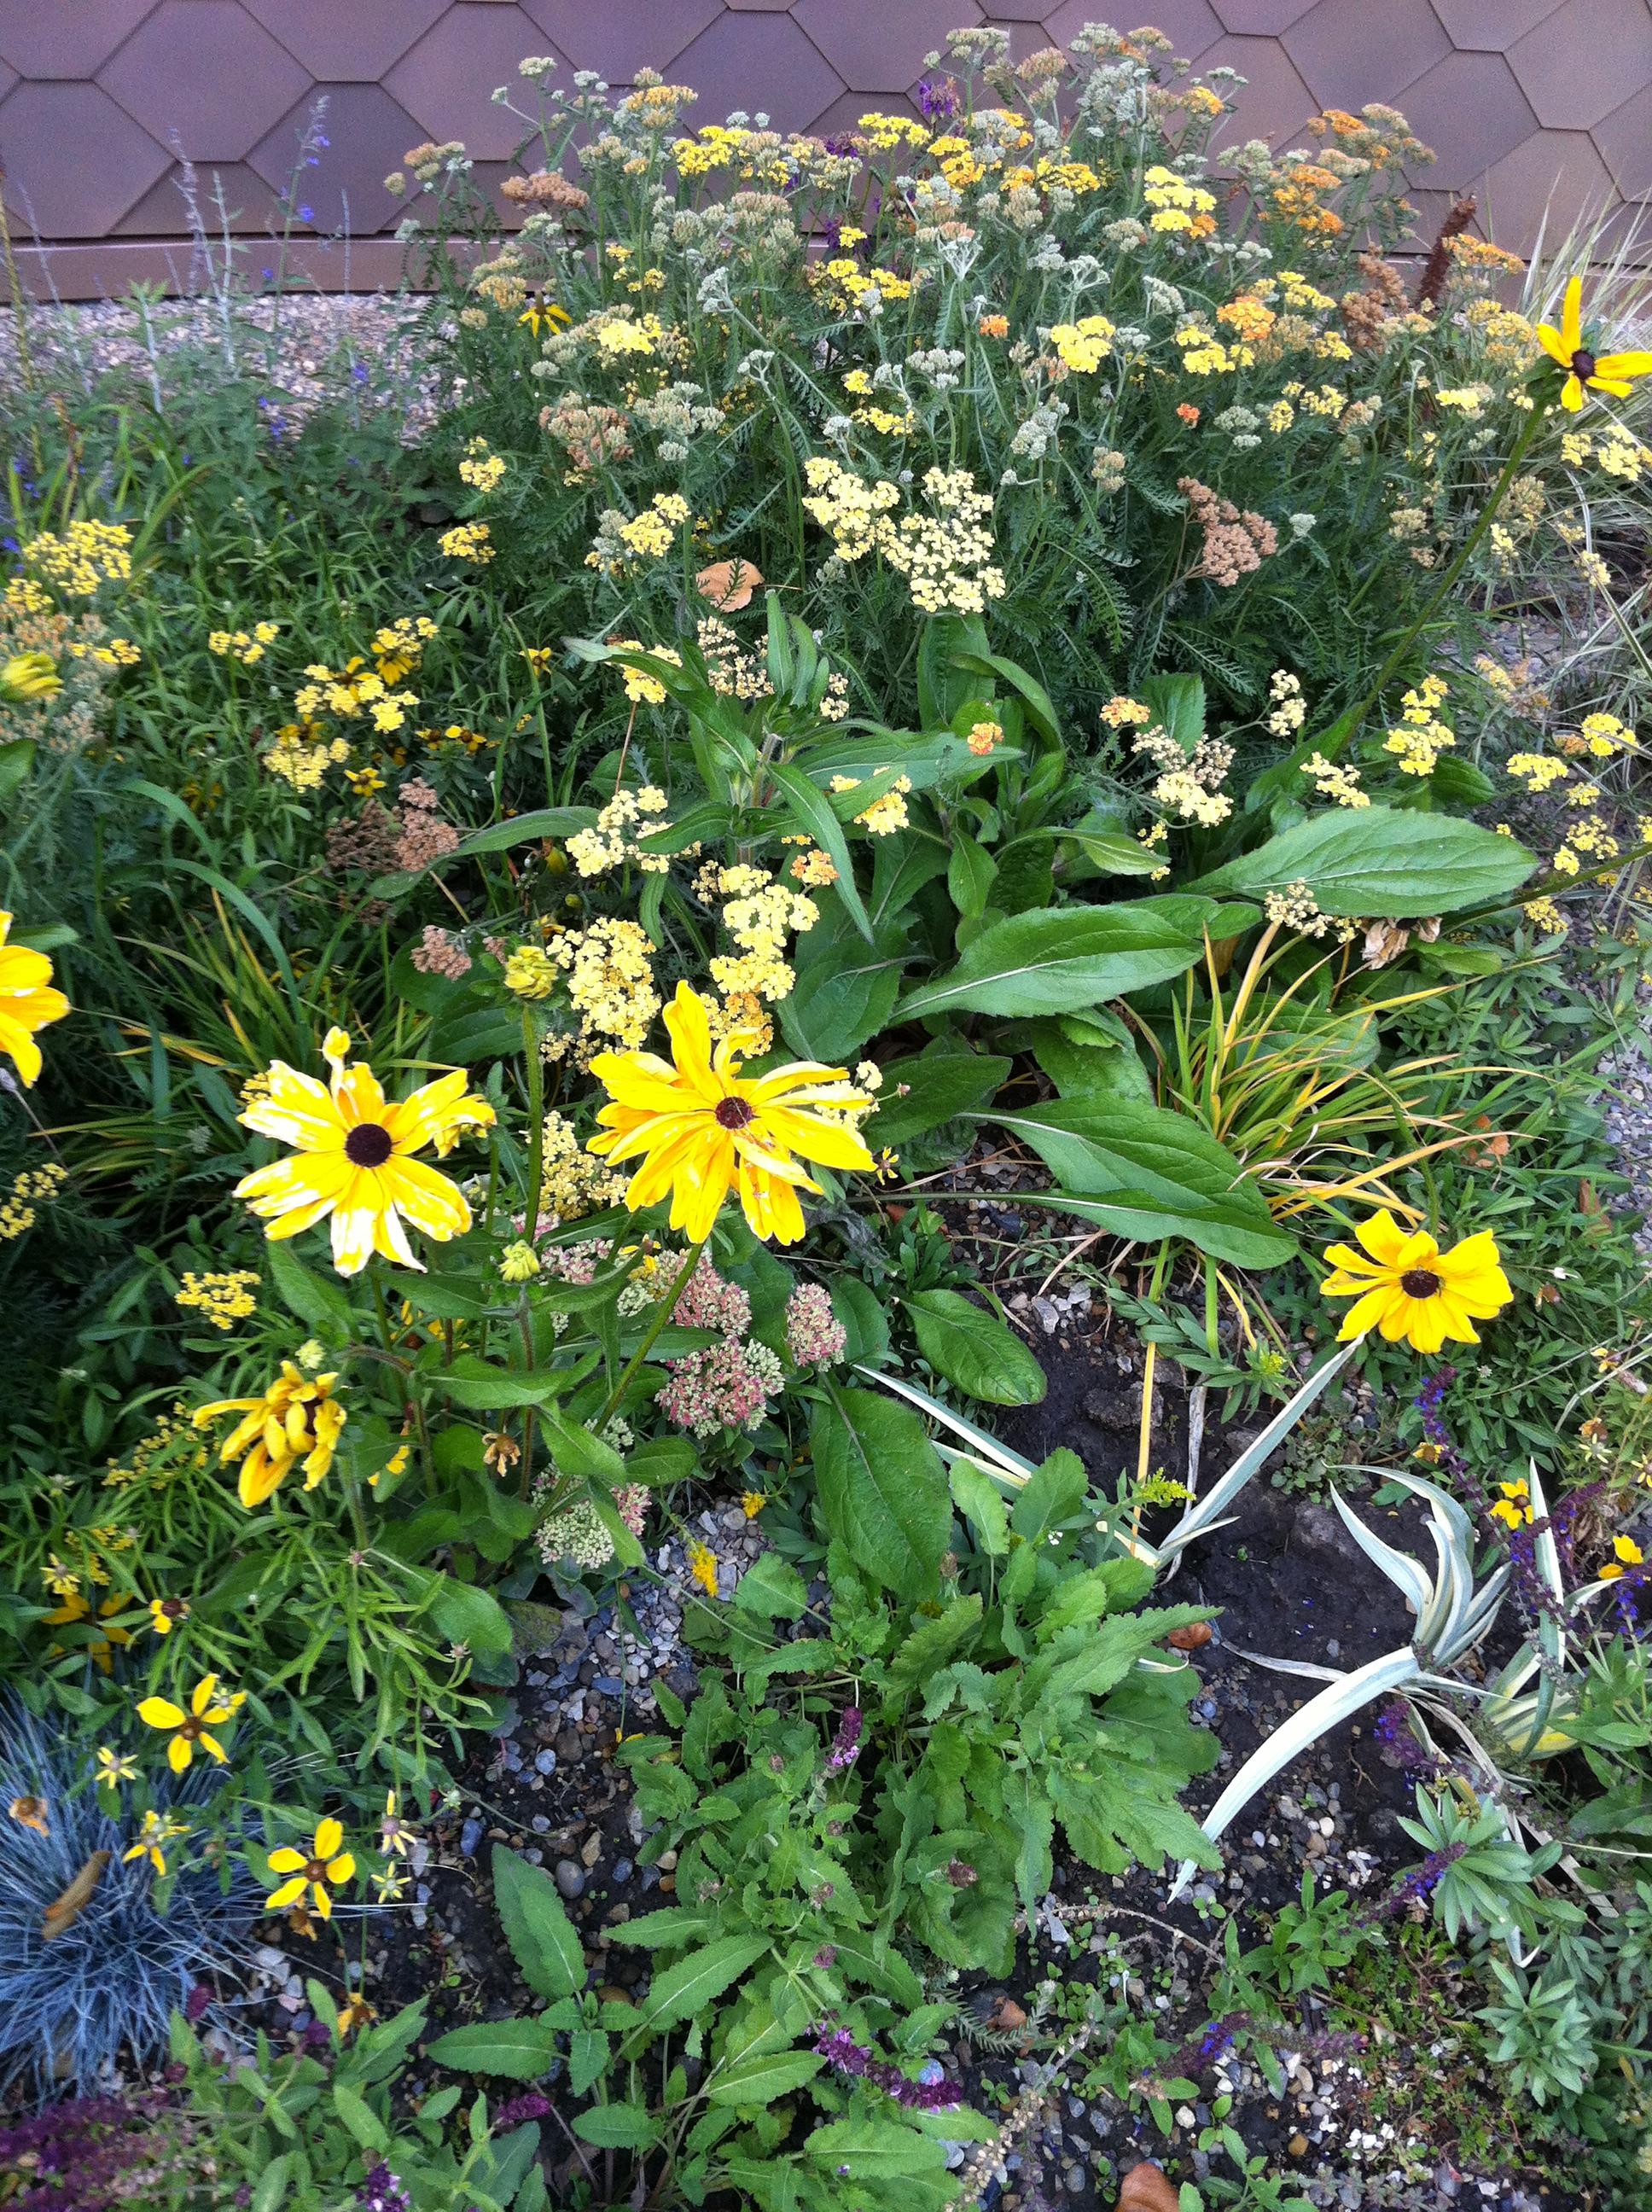 Pollinator garden_Hygge2.JPG